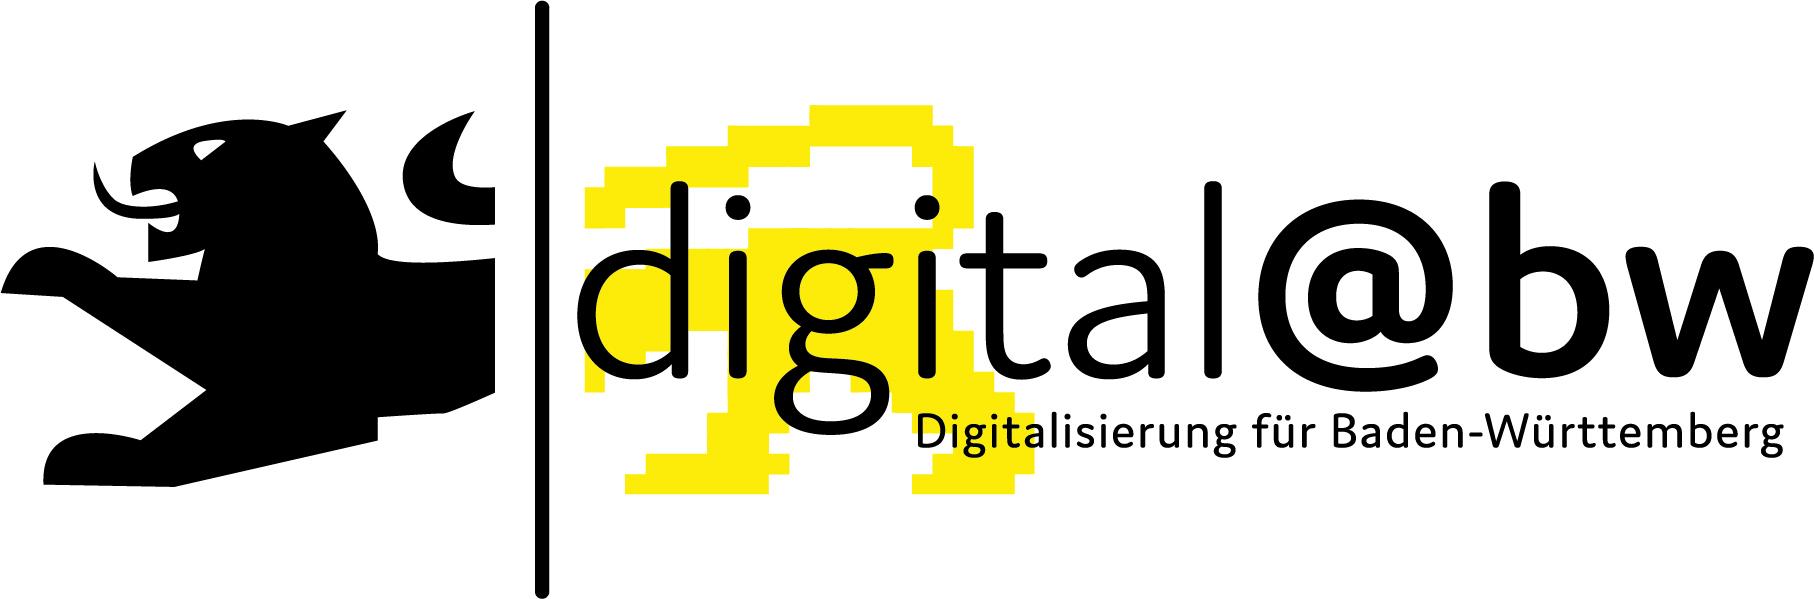 Logo_digital@bw_subline